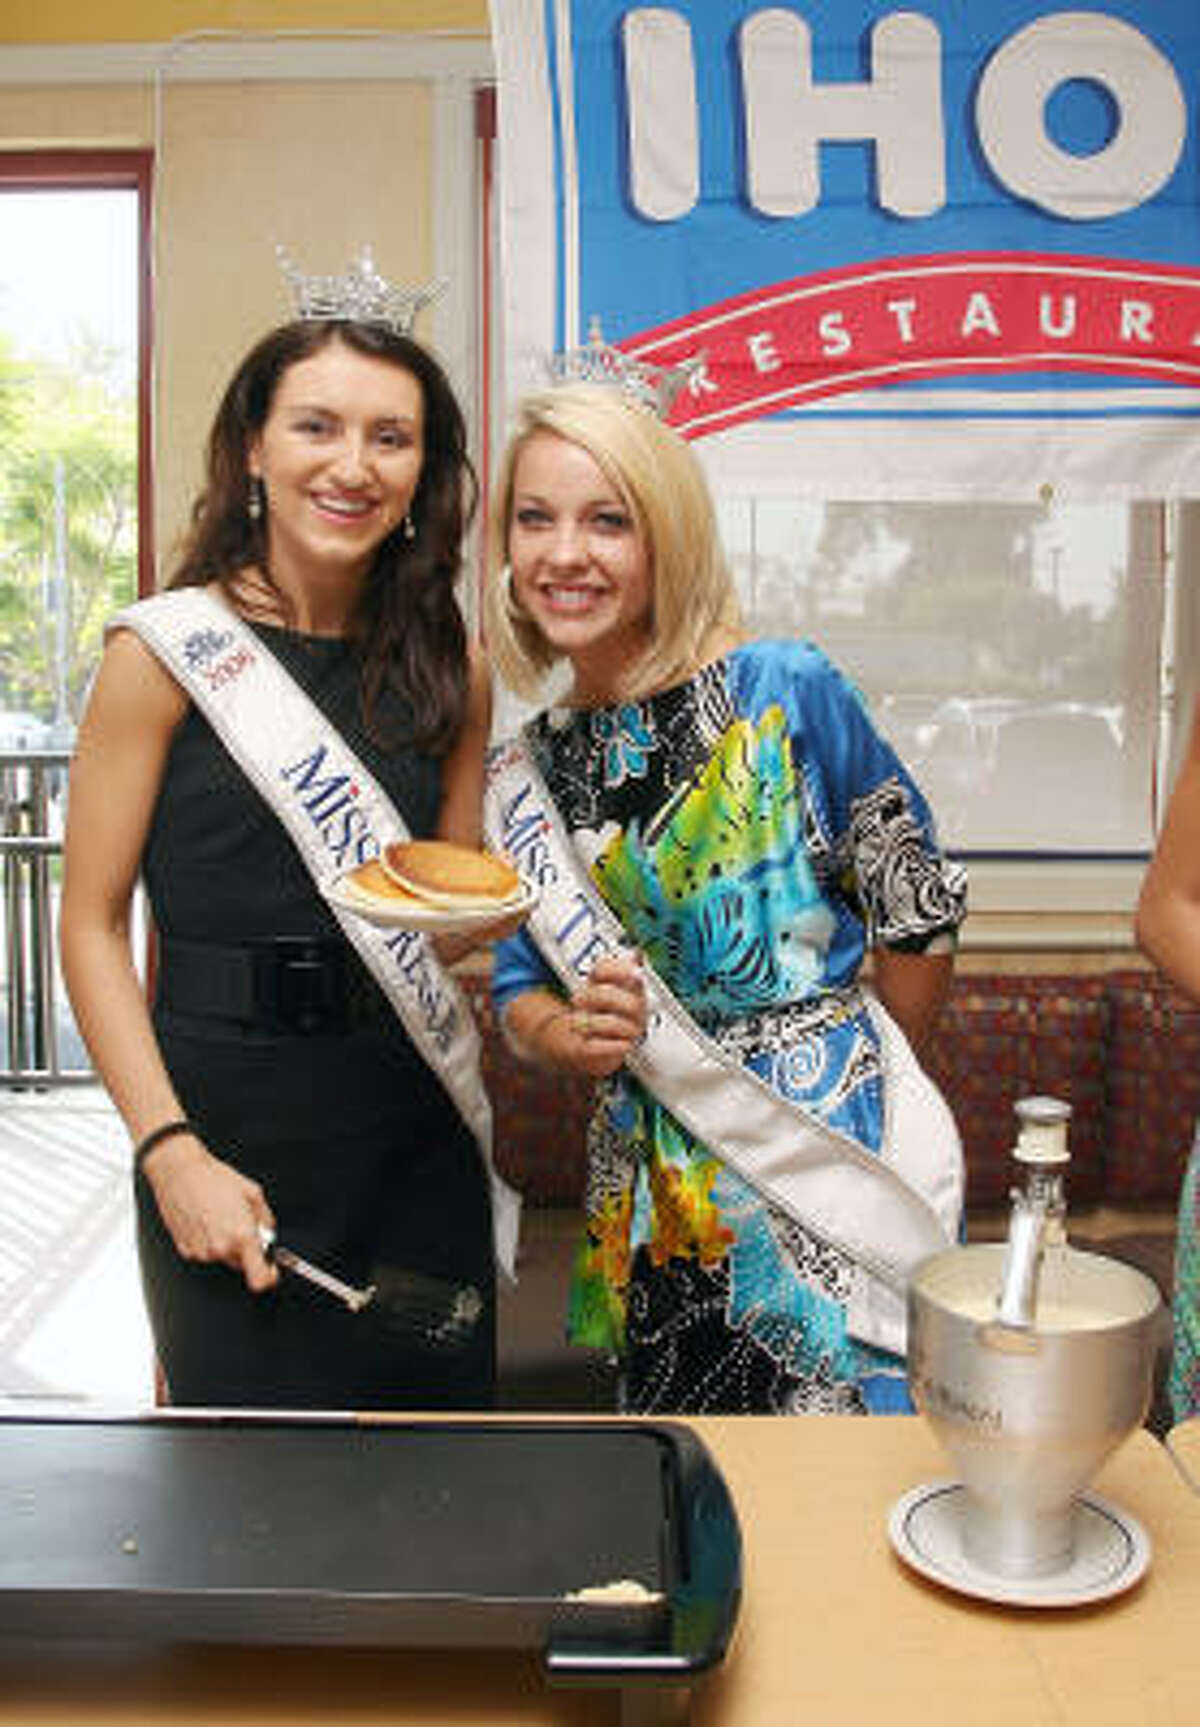 Miss Oregon Danijela Krstic, left, and Miss Texas Rebecca Robinson attend the 2009 Miss America Contestants